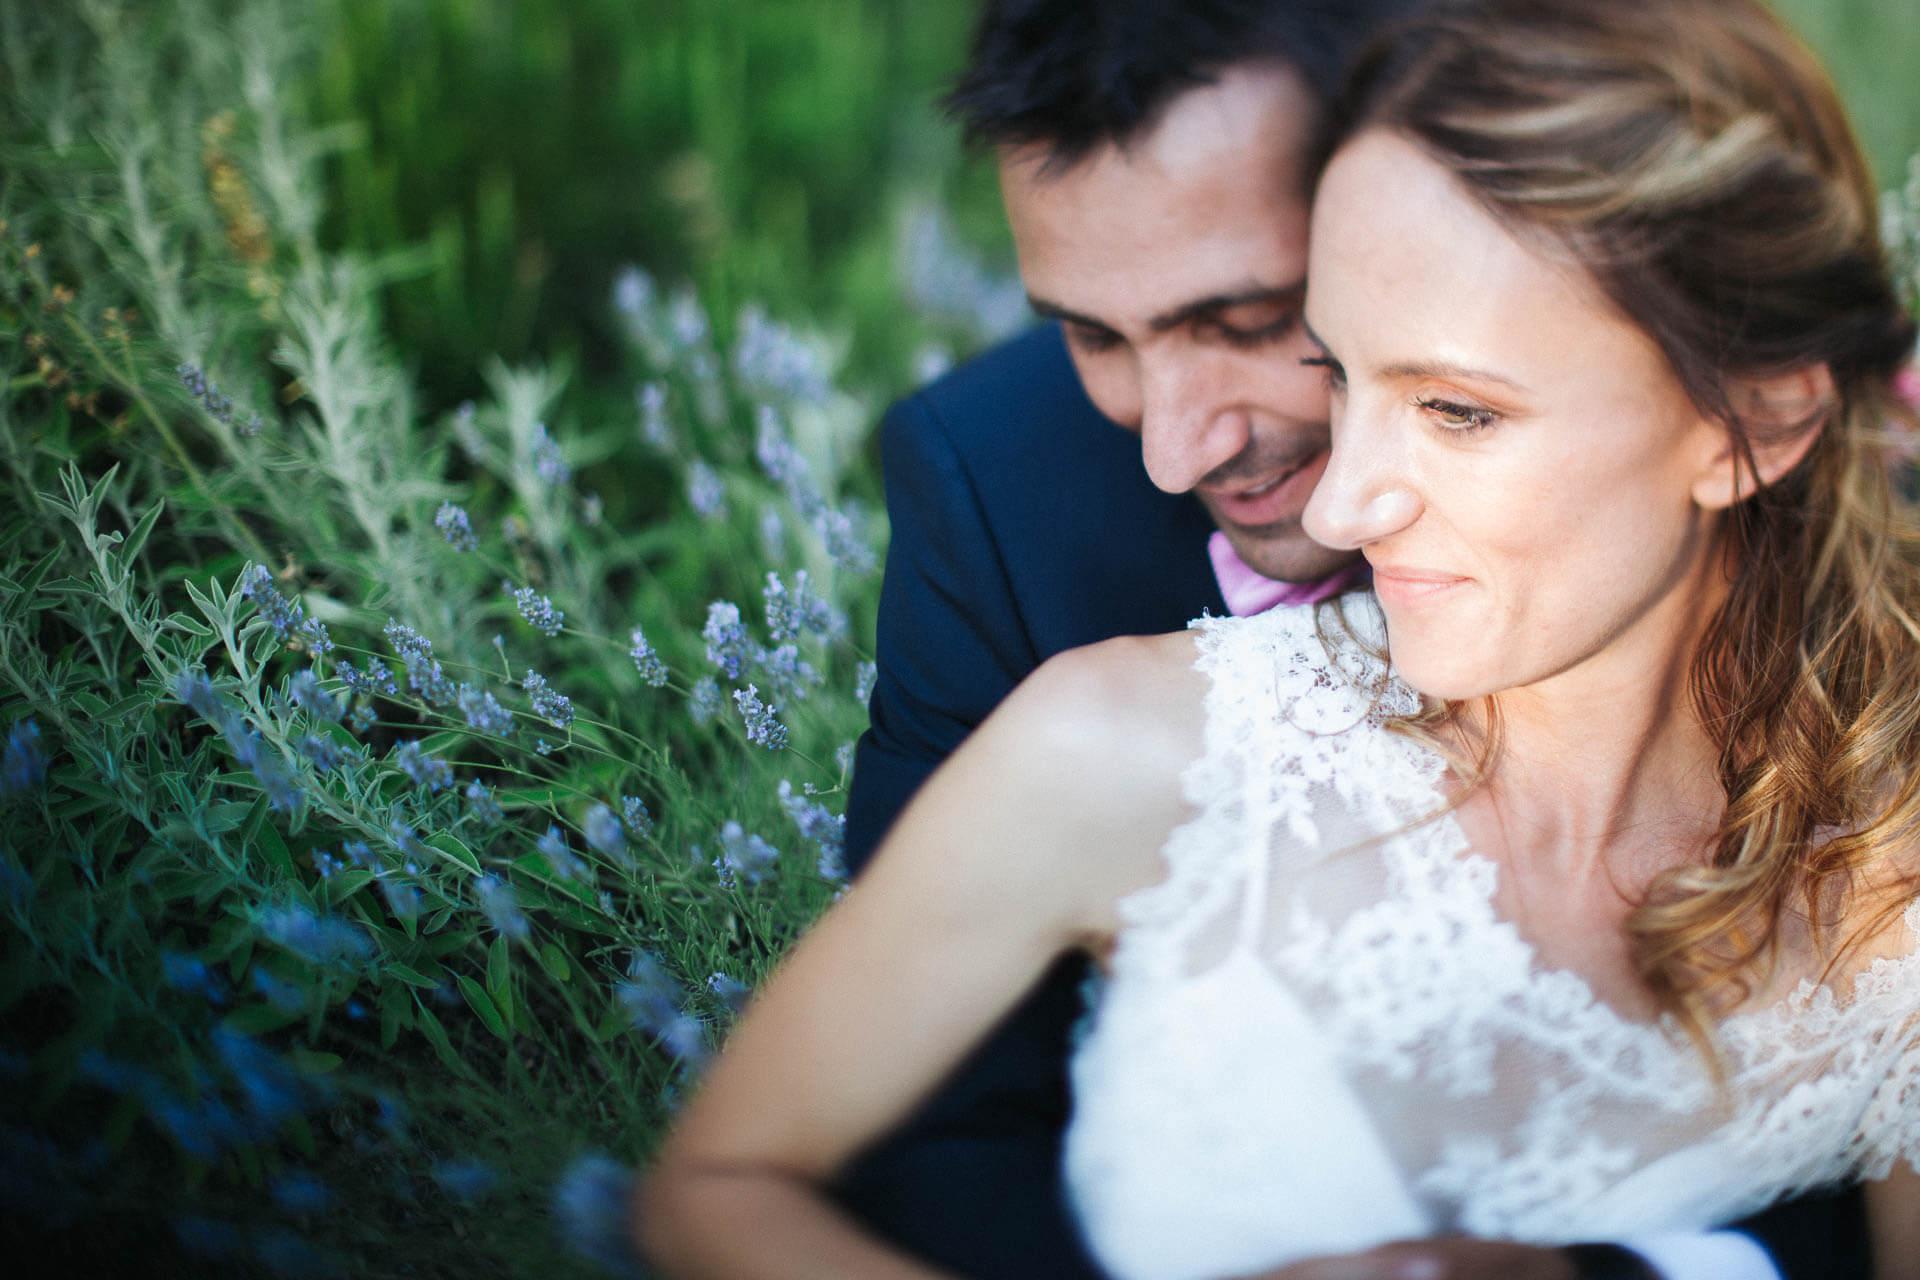 photographe-mariage-aix-en-provence-stephanie-jerome-24